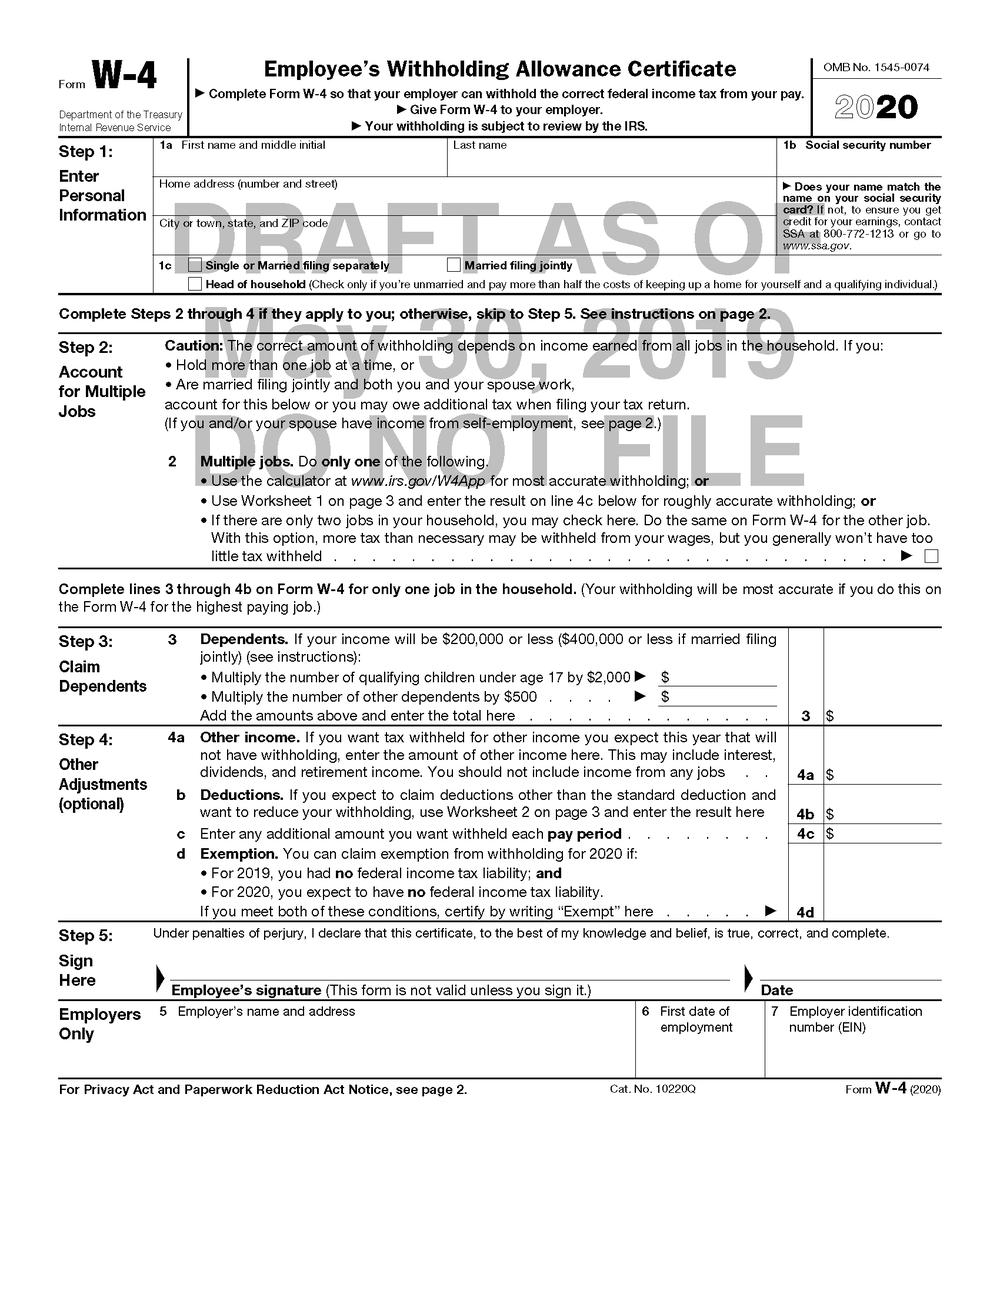 2020 W9 Blank Tax Form | Example Calendar Printable (With-2020 W9 Blank Tax Form